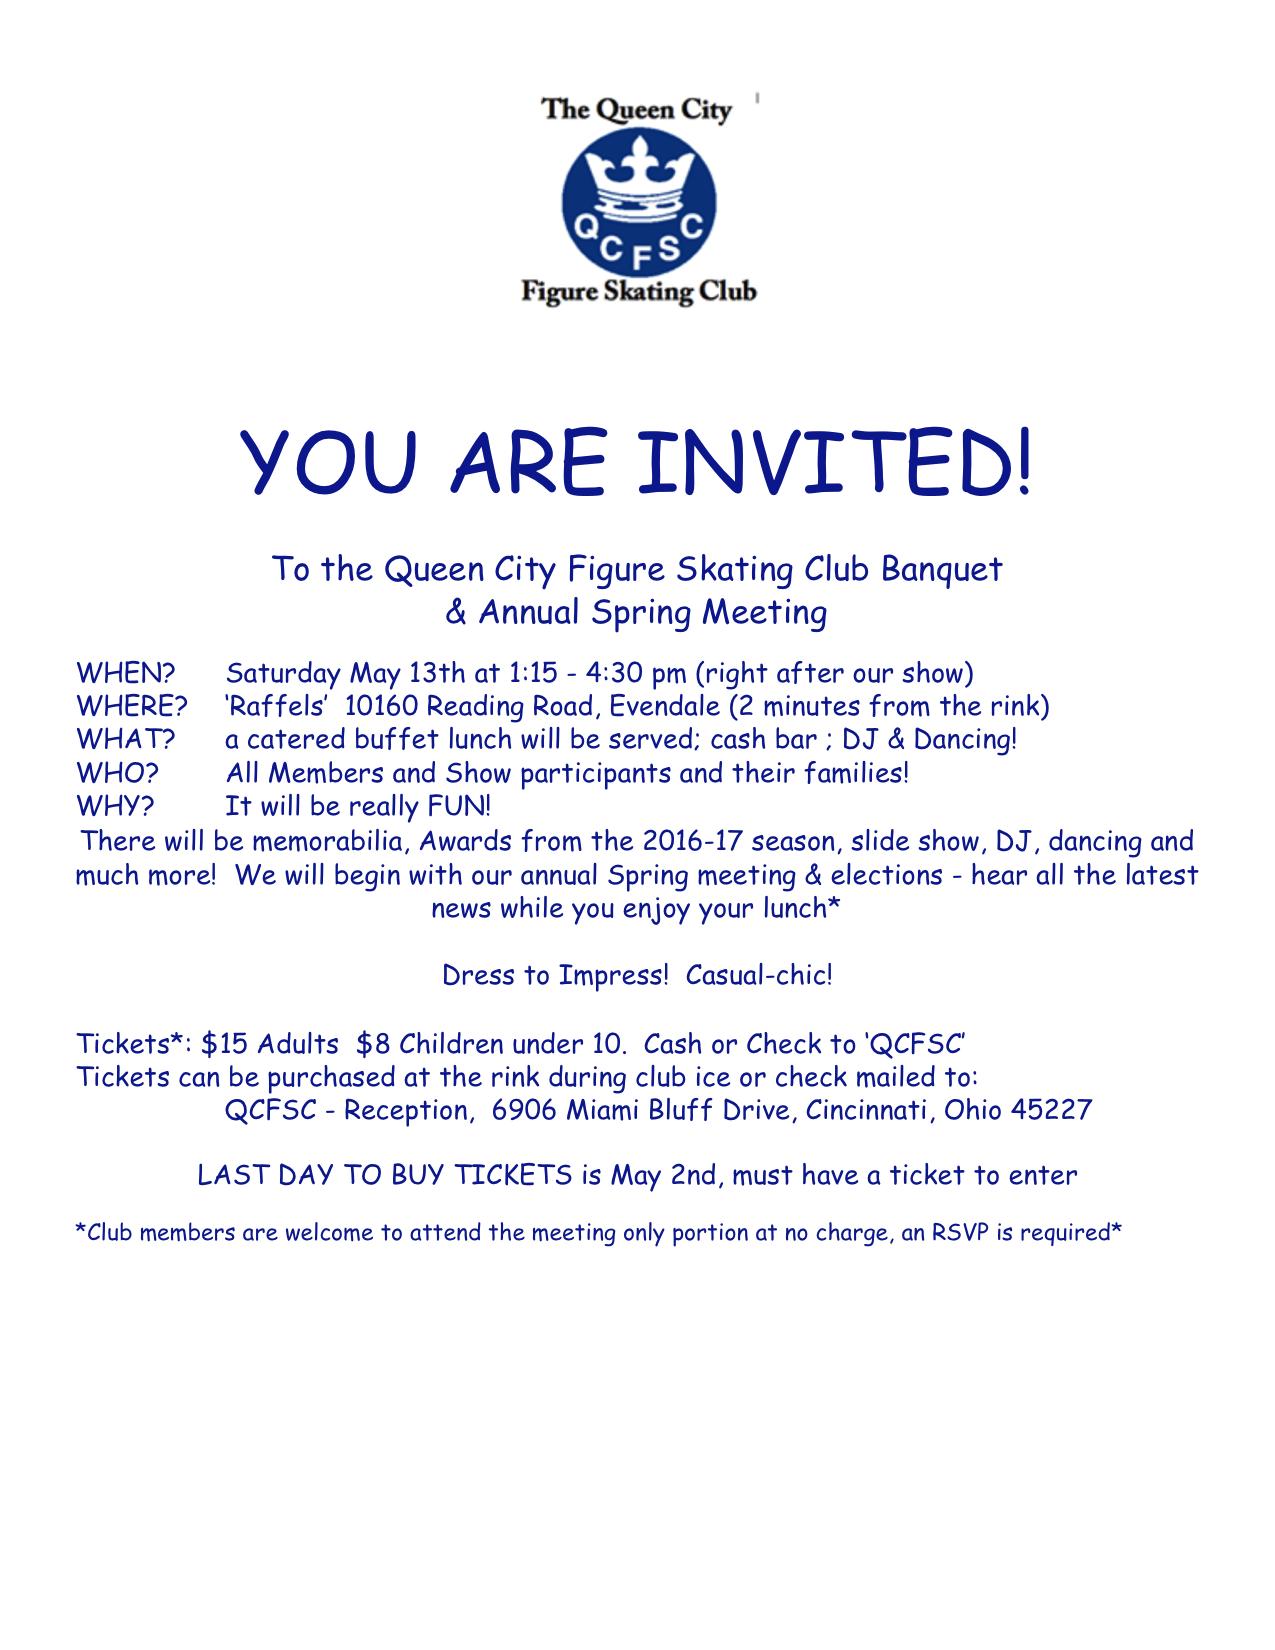 spring_annual_meeting_invite_2017